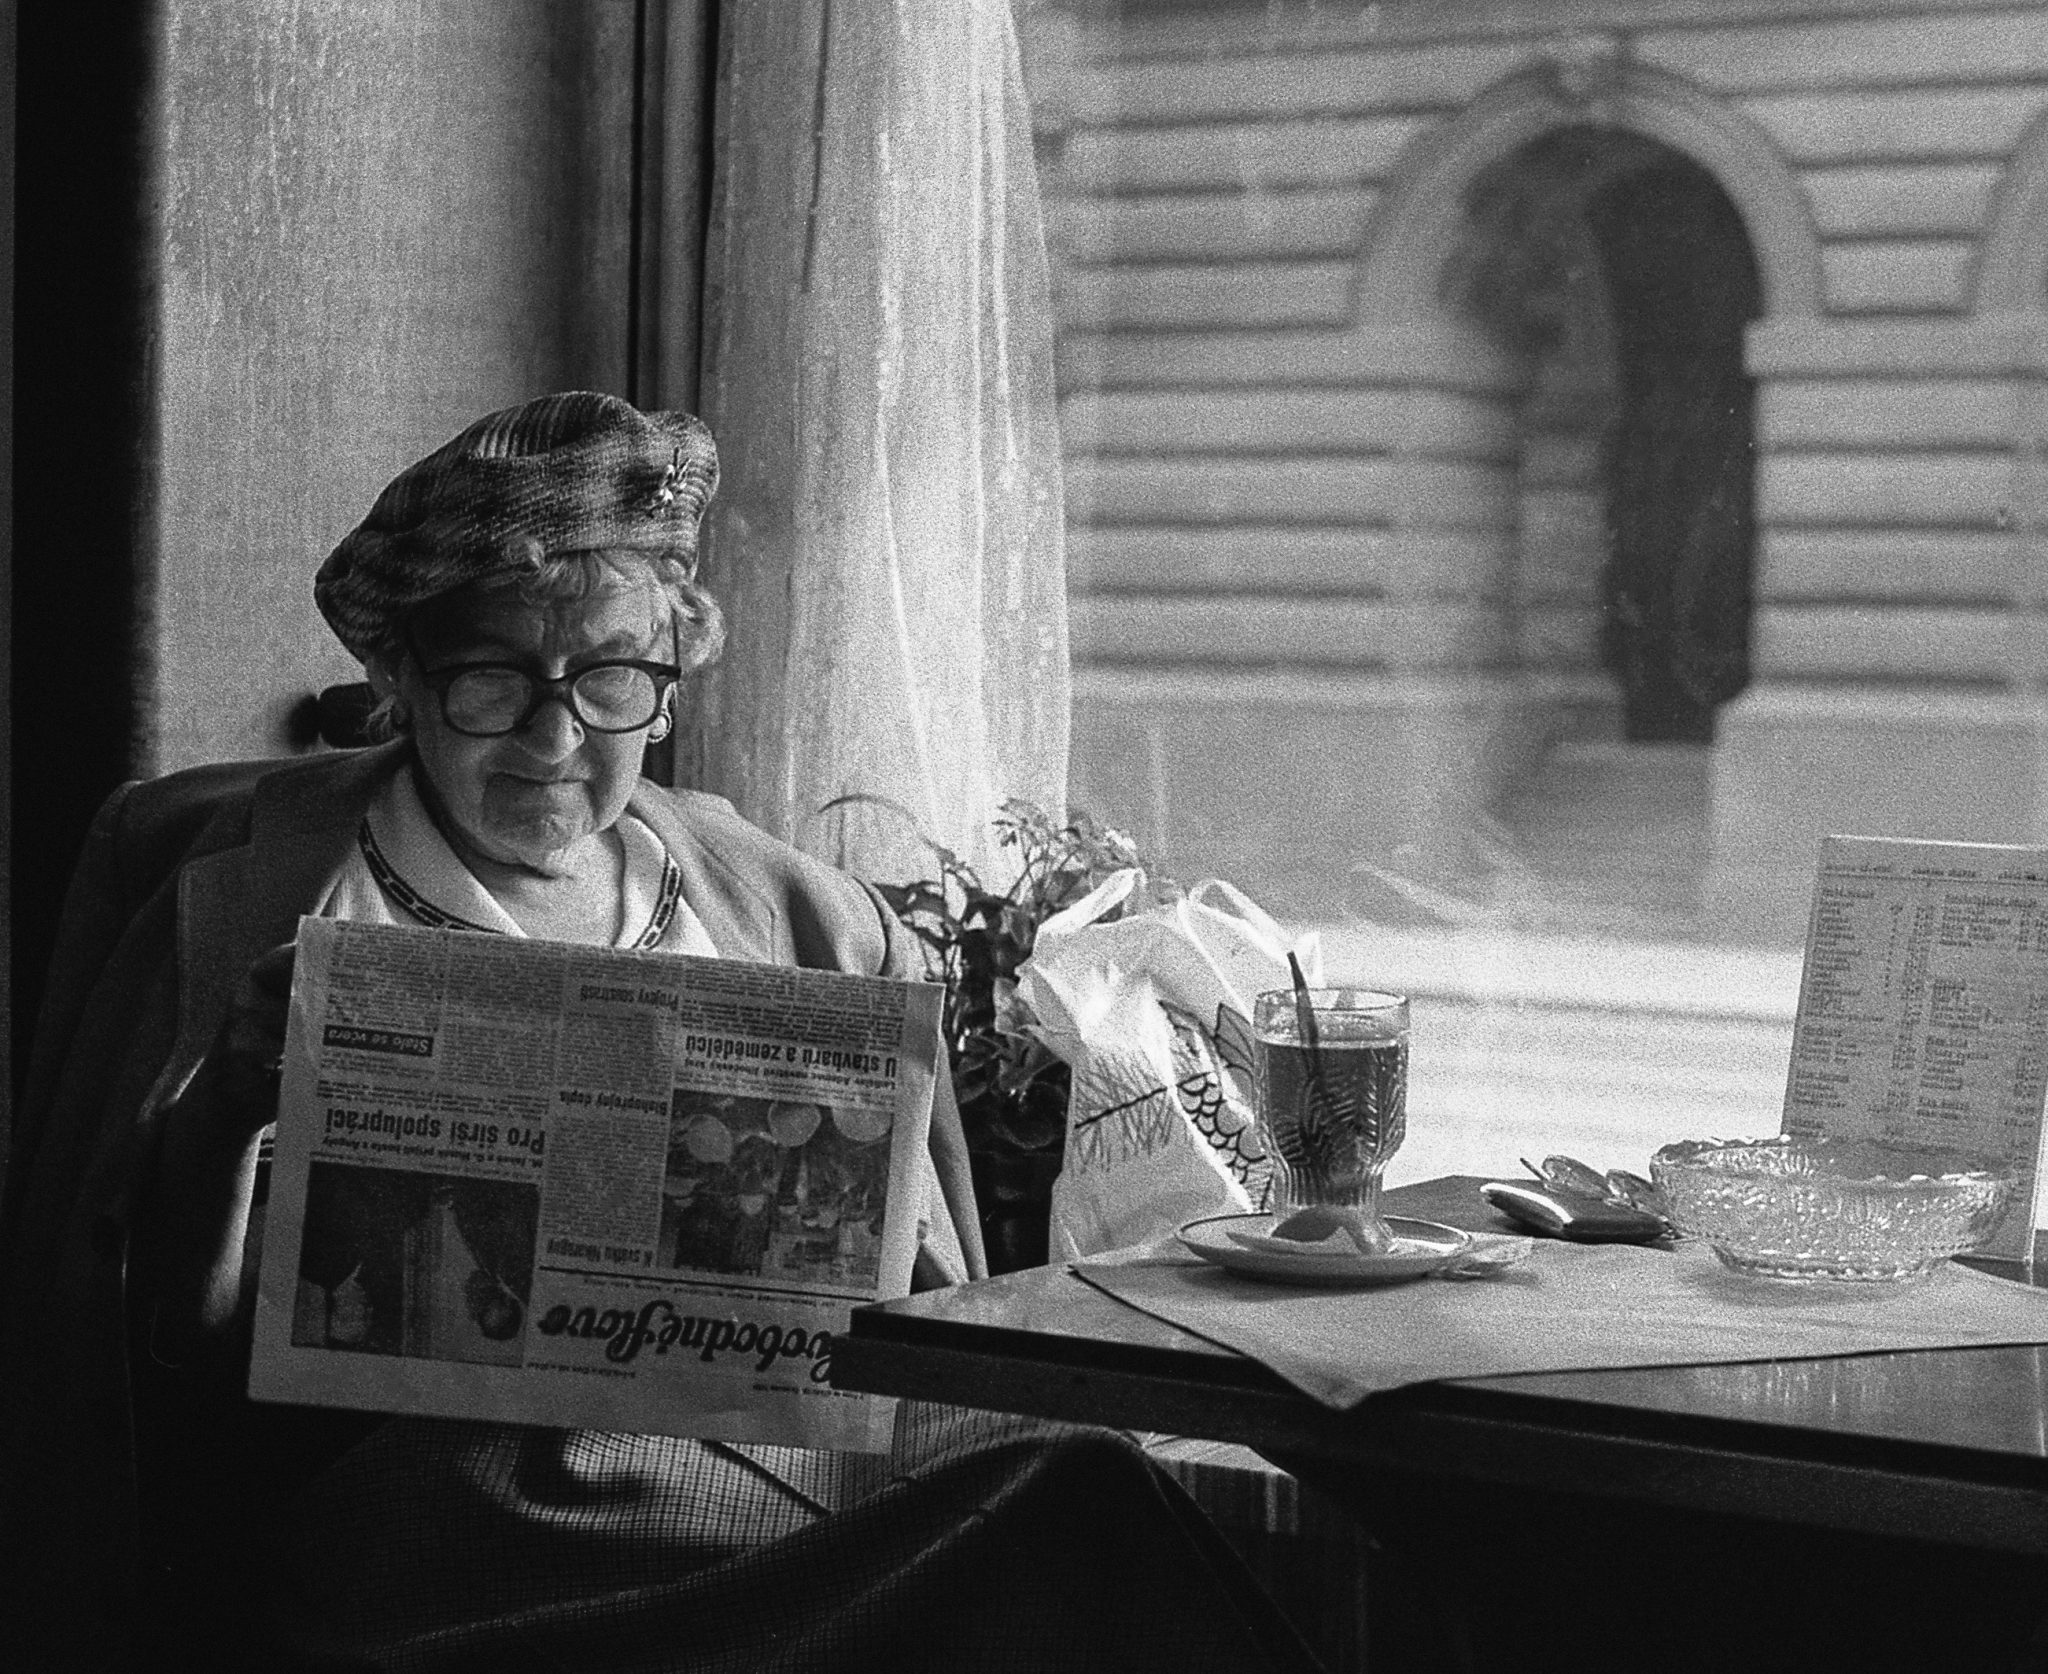 Oma liest Zeitung im Café